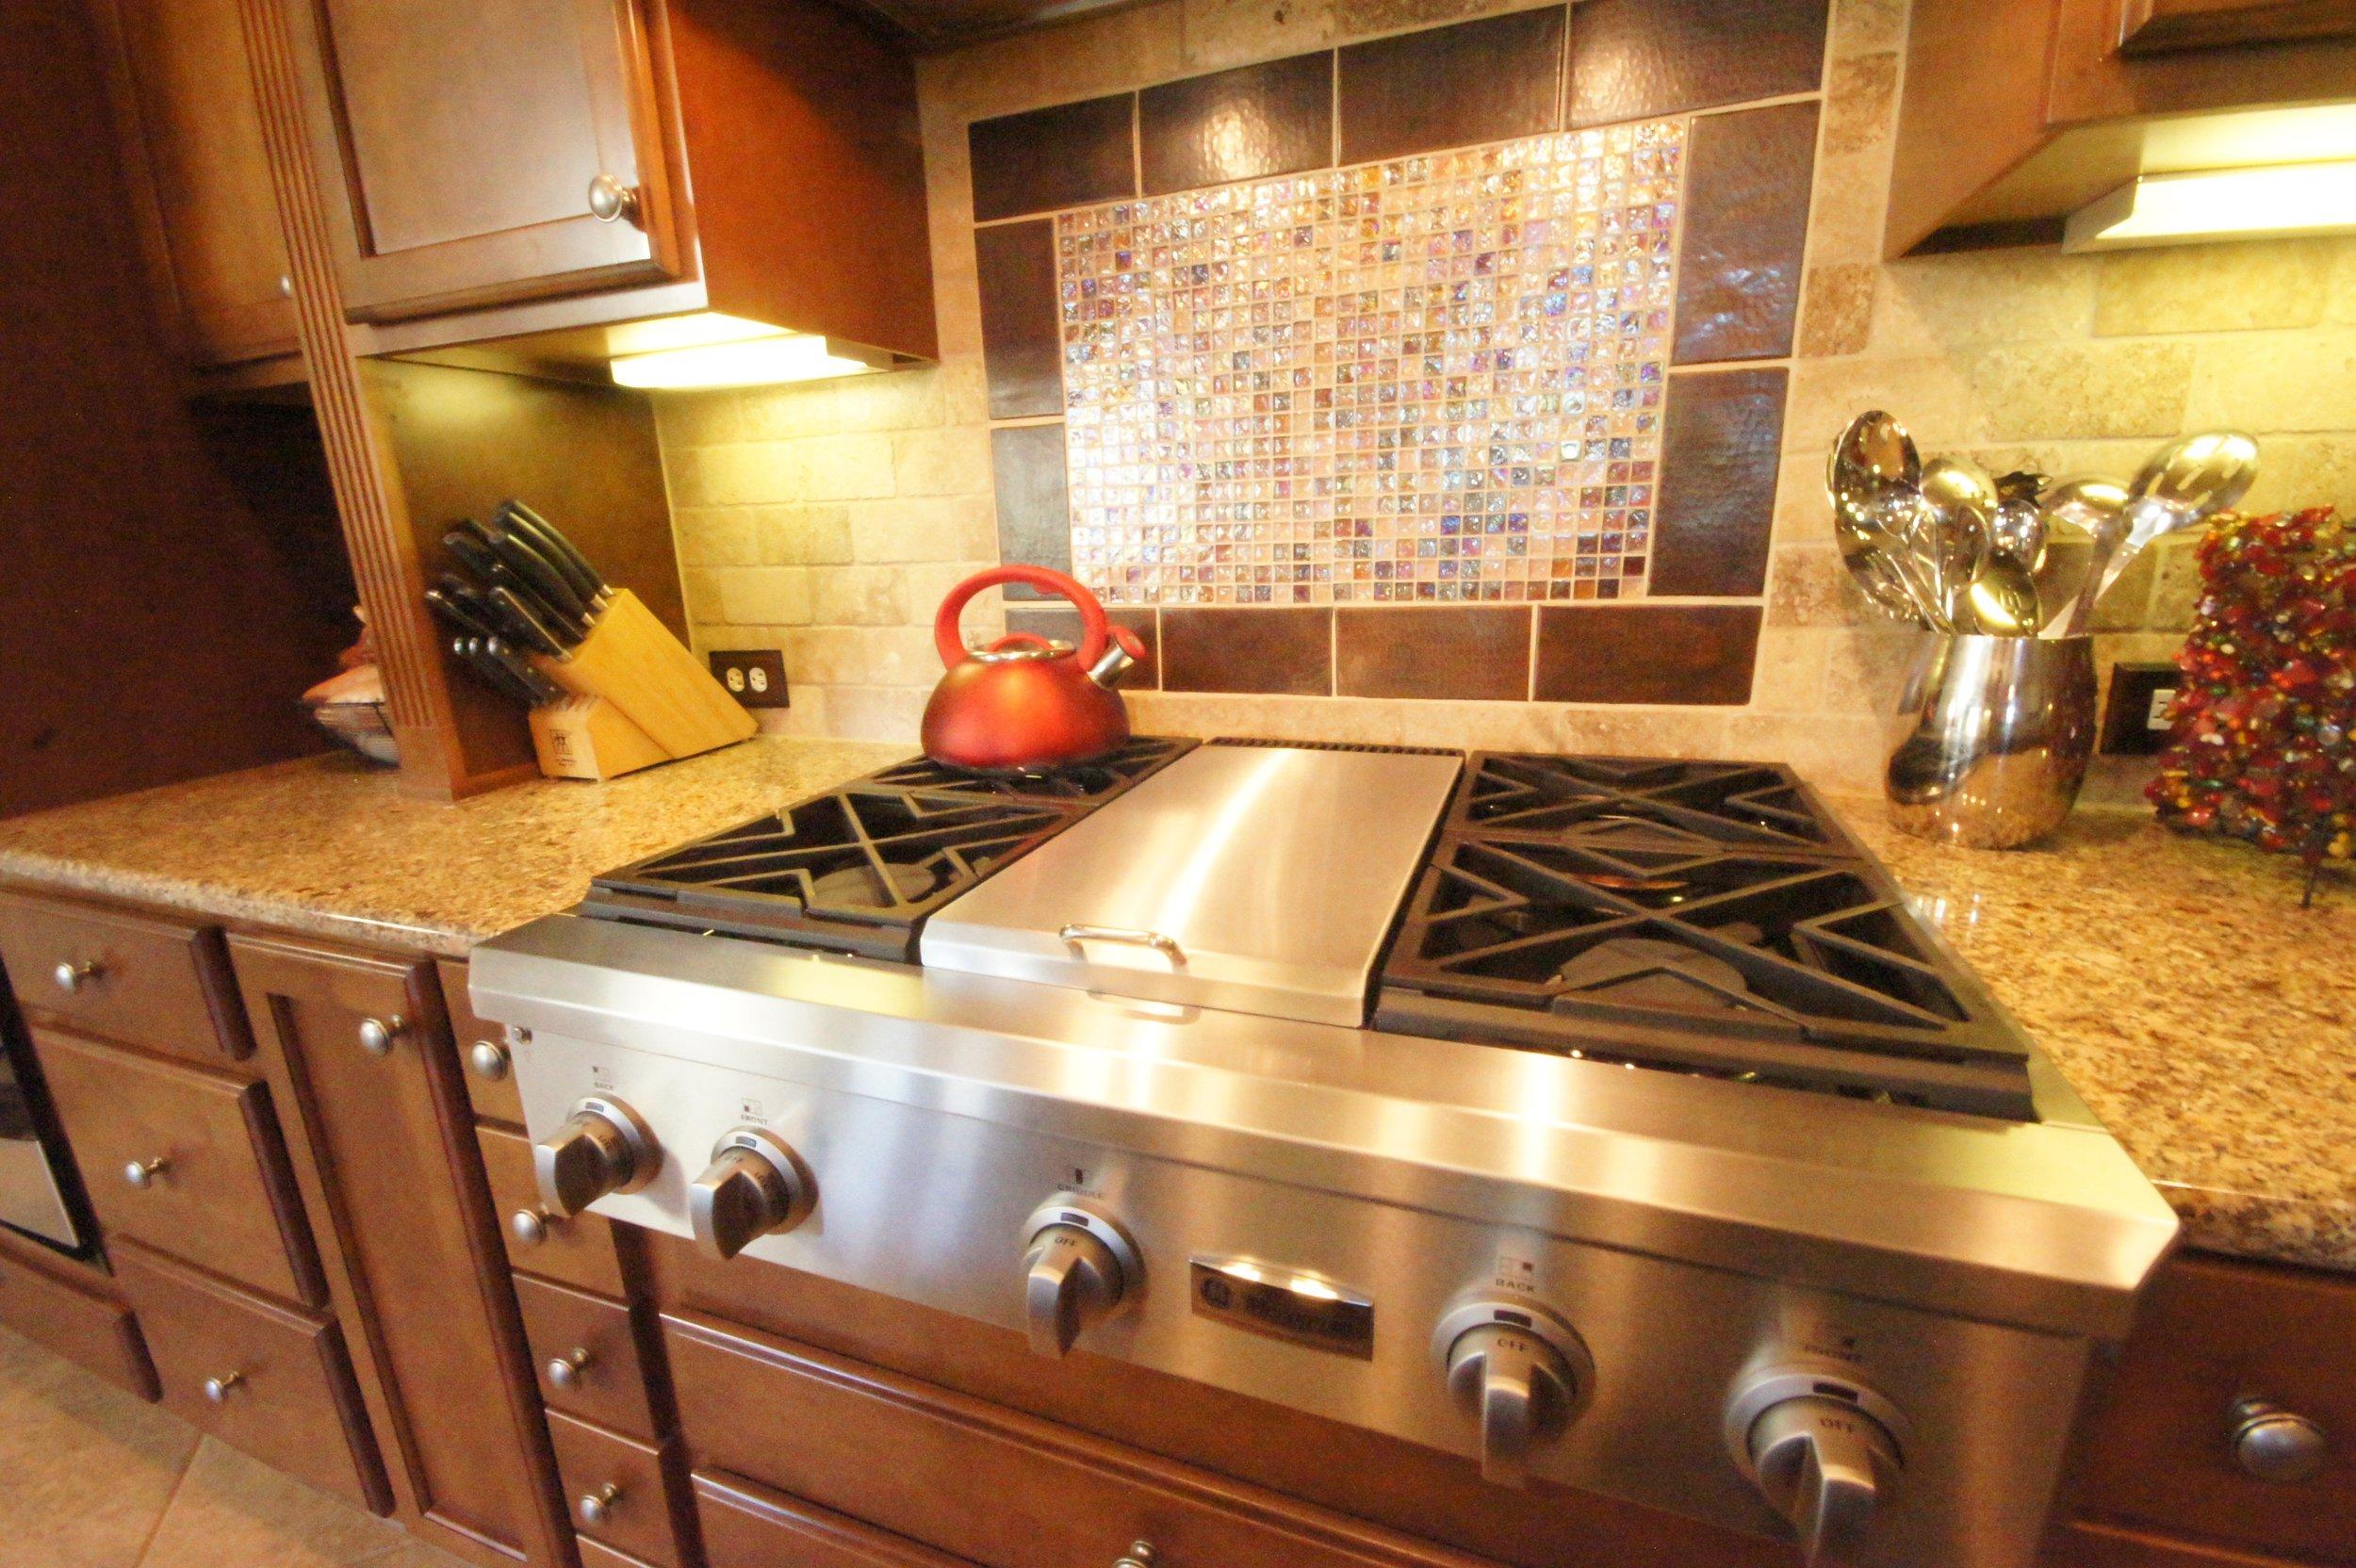 kitchencooktop1.jpg